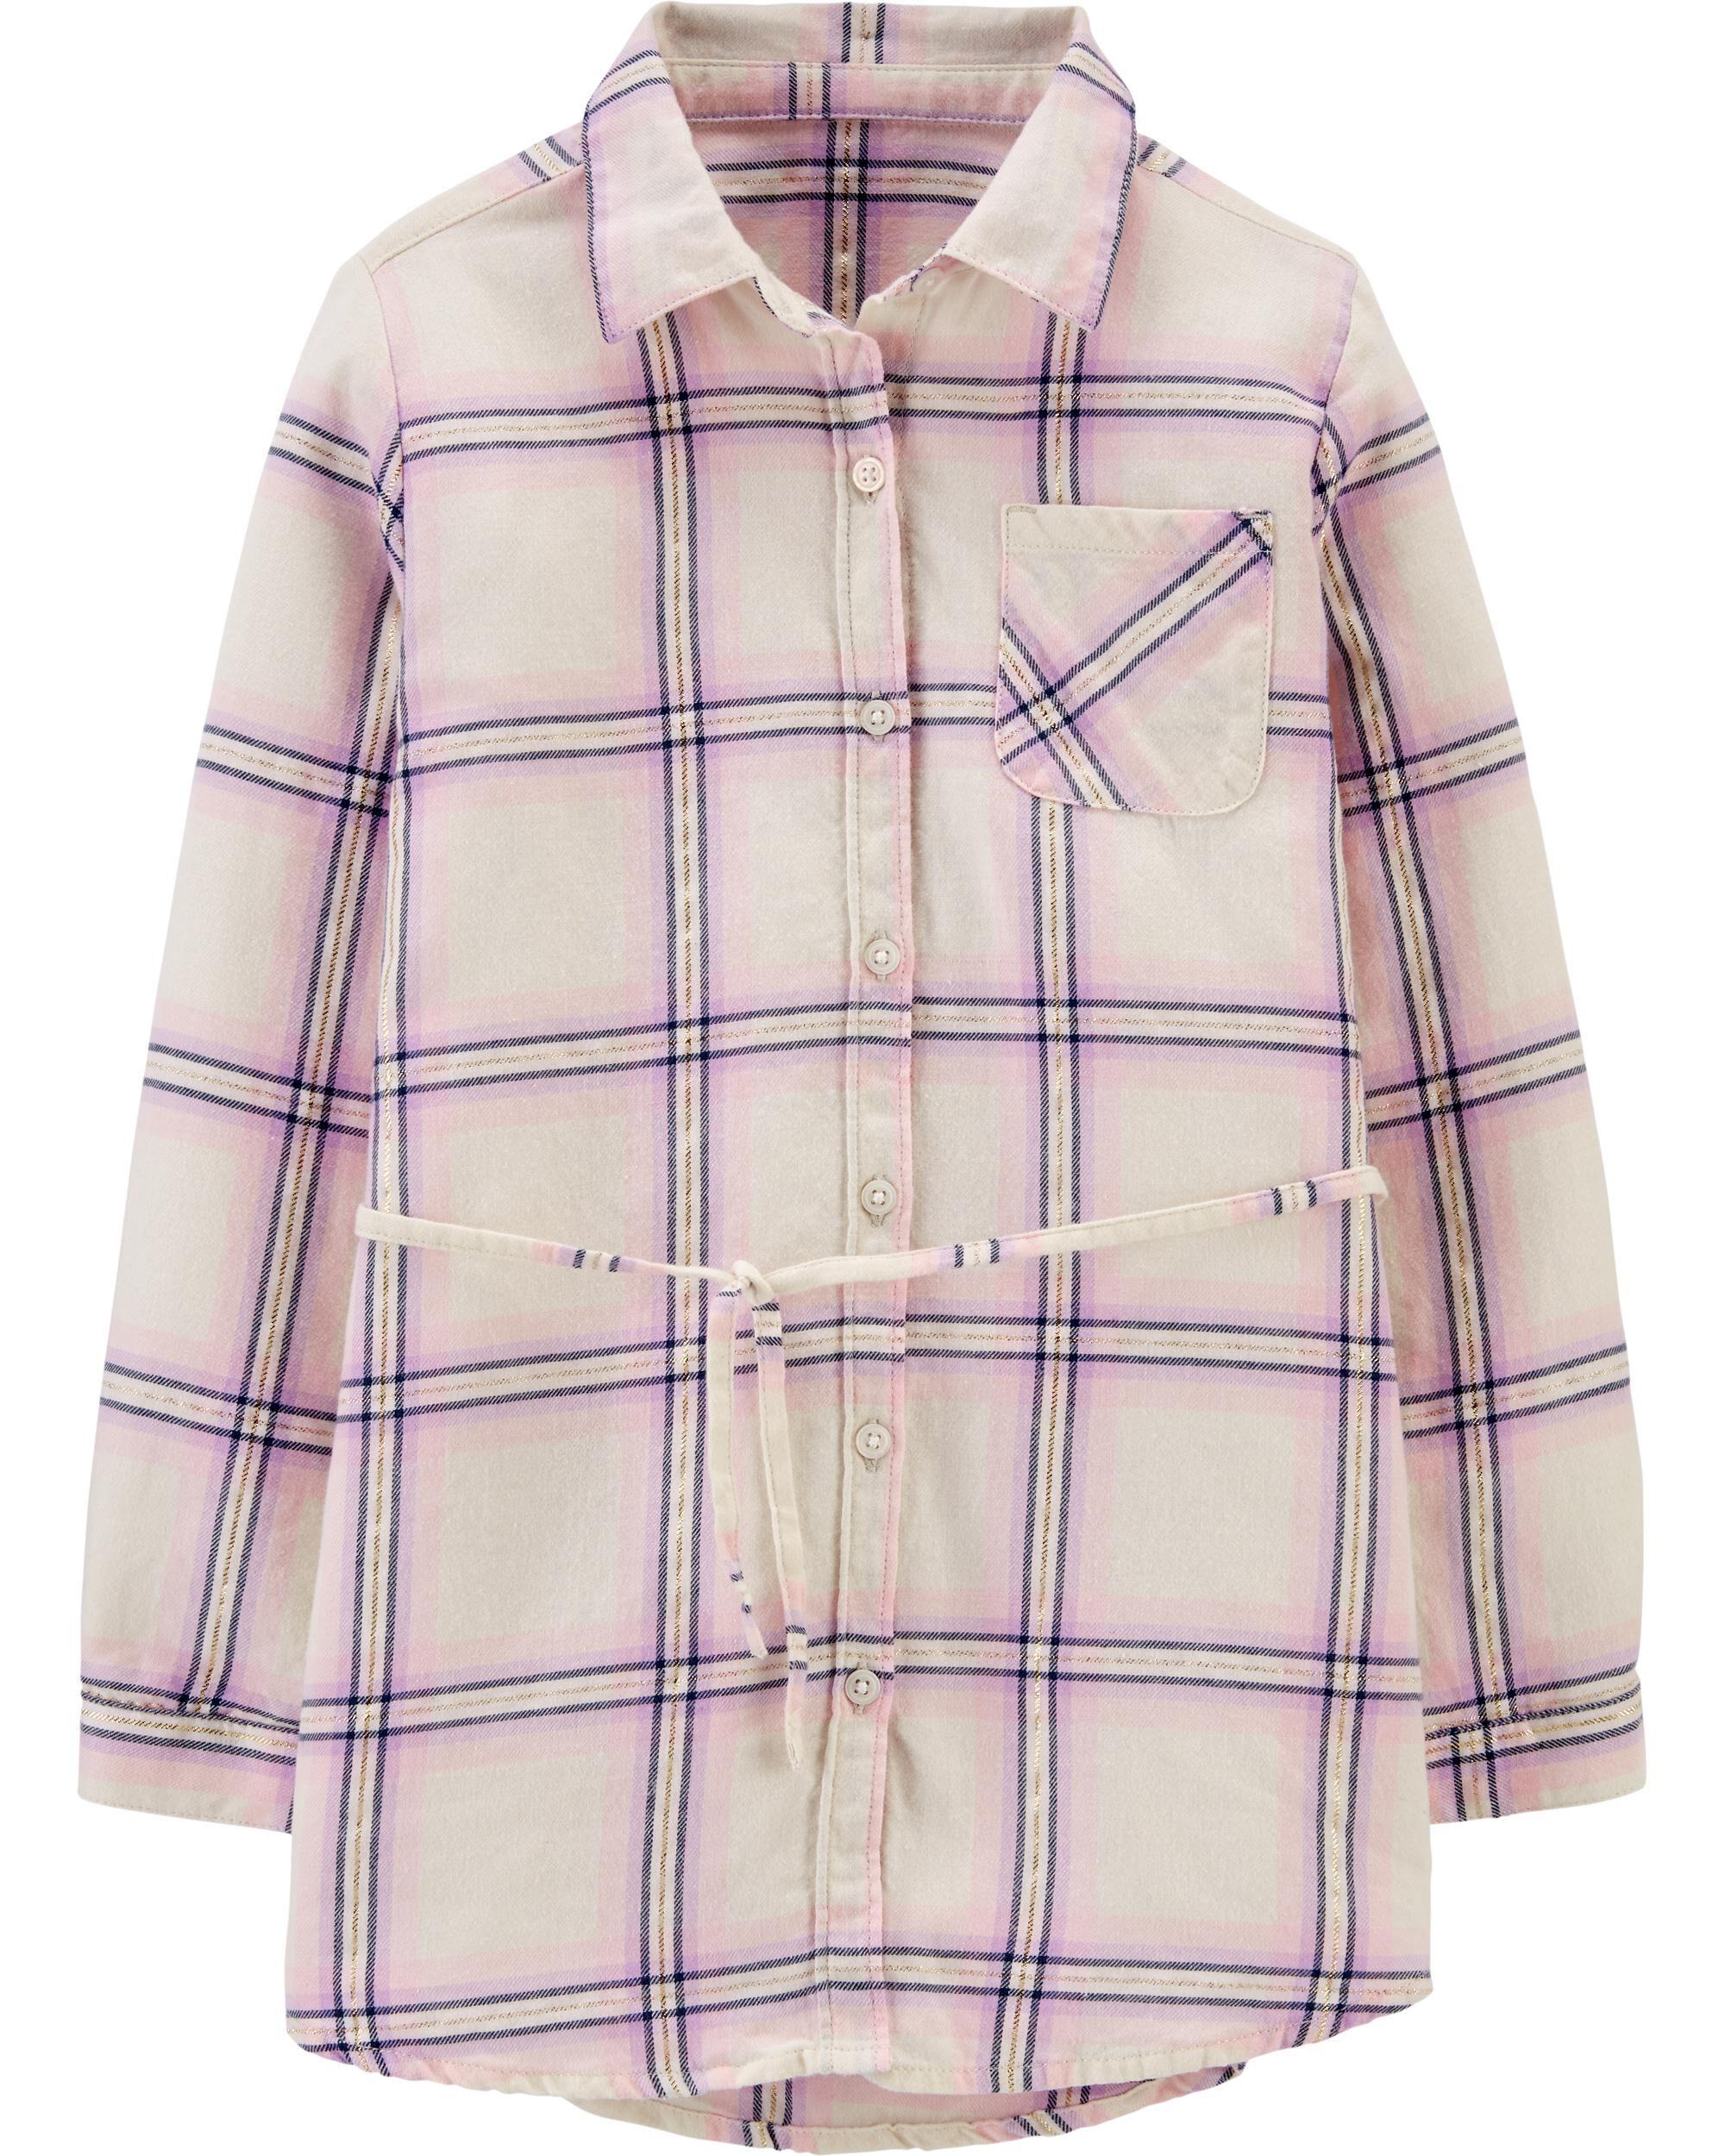 *CLEARANCE*Metallic Plaid Flannel Tunic